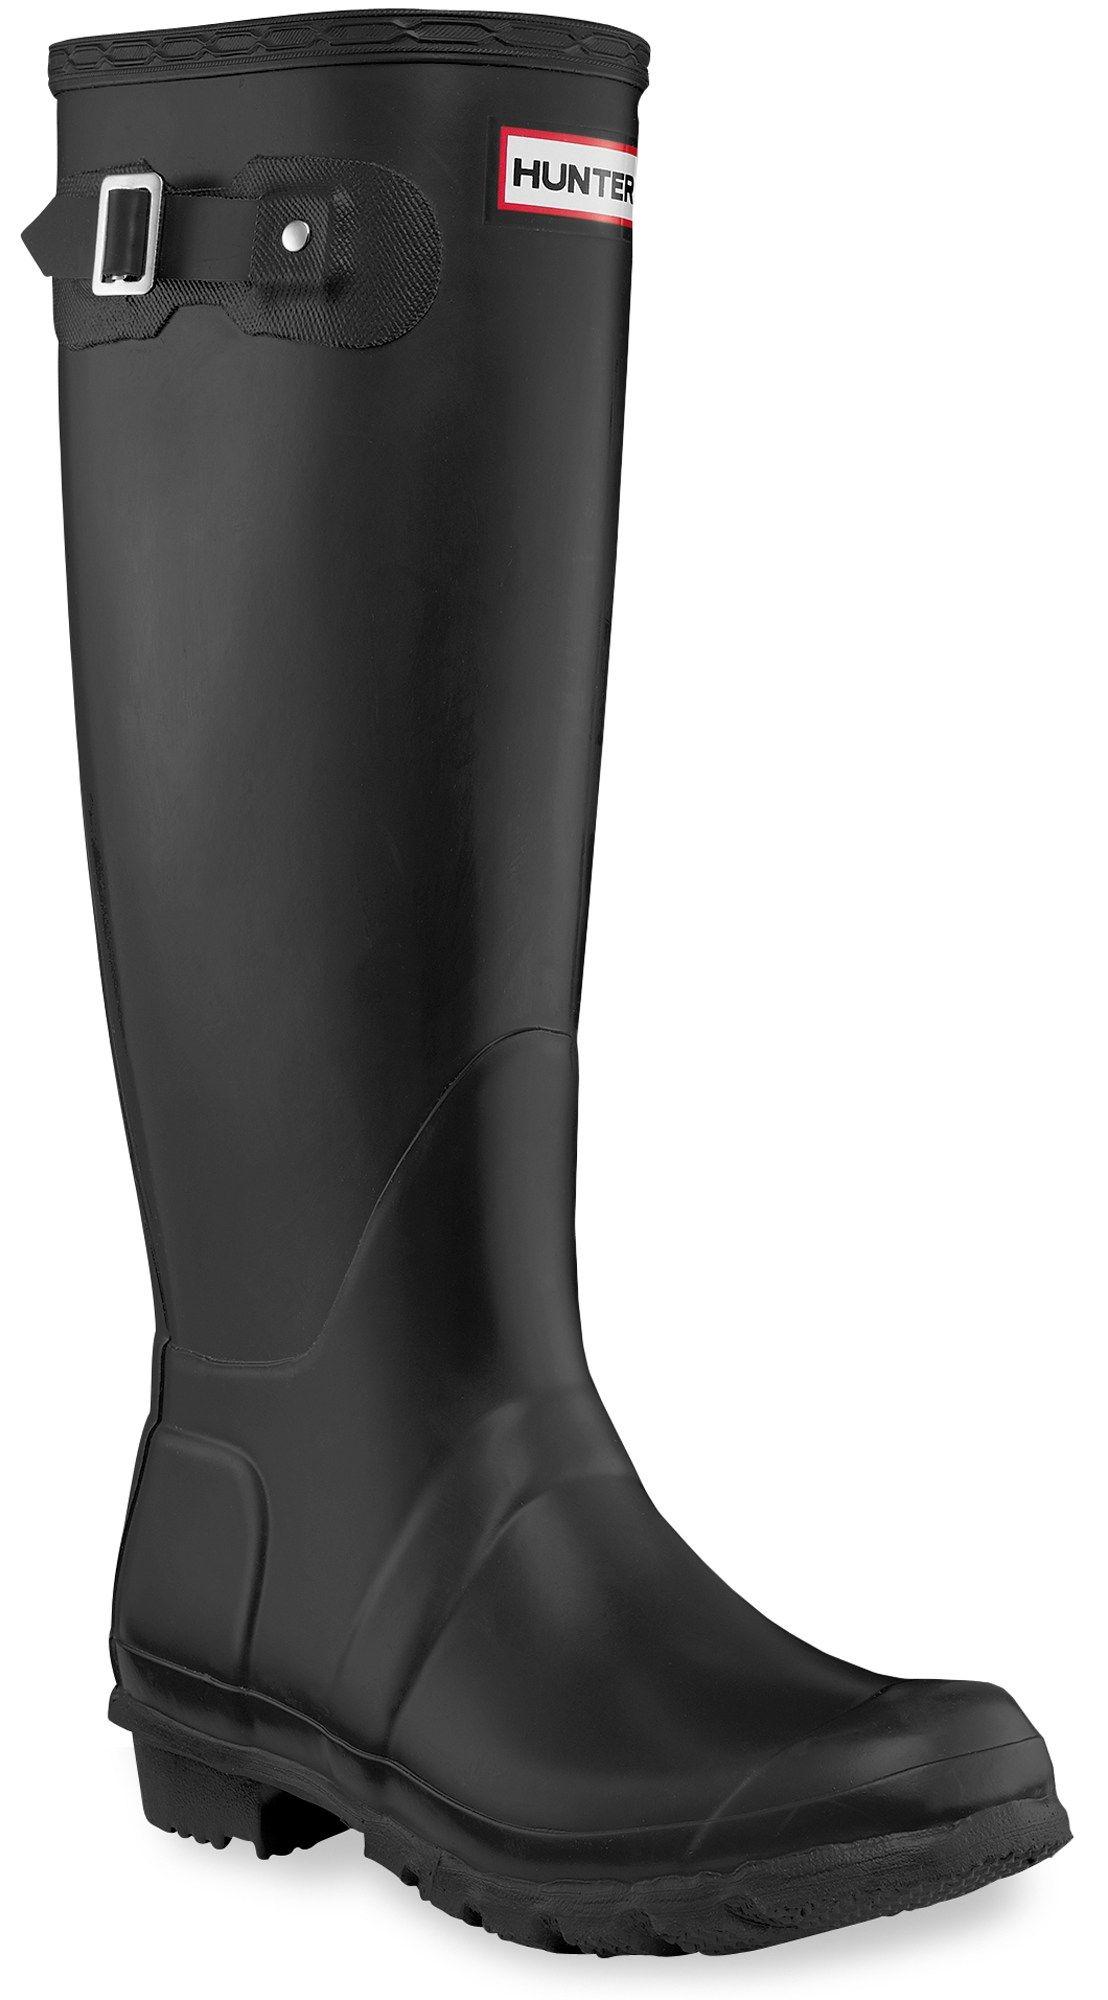 Original Tall Wellington Rain Boots - Women' In 2019 Scouting Qwn Klder